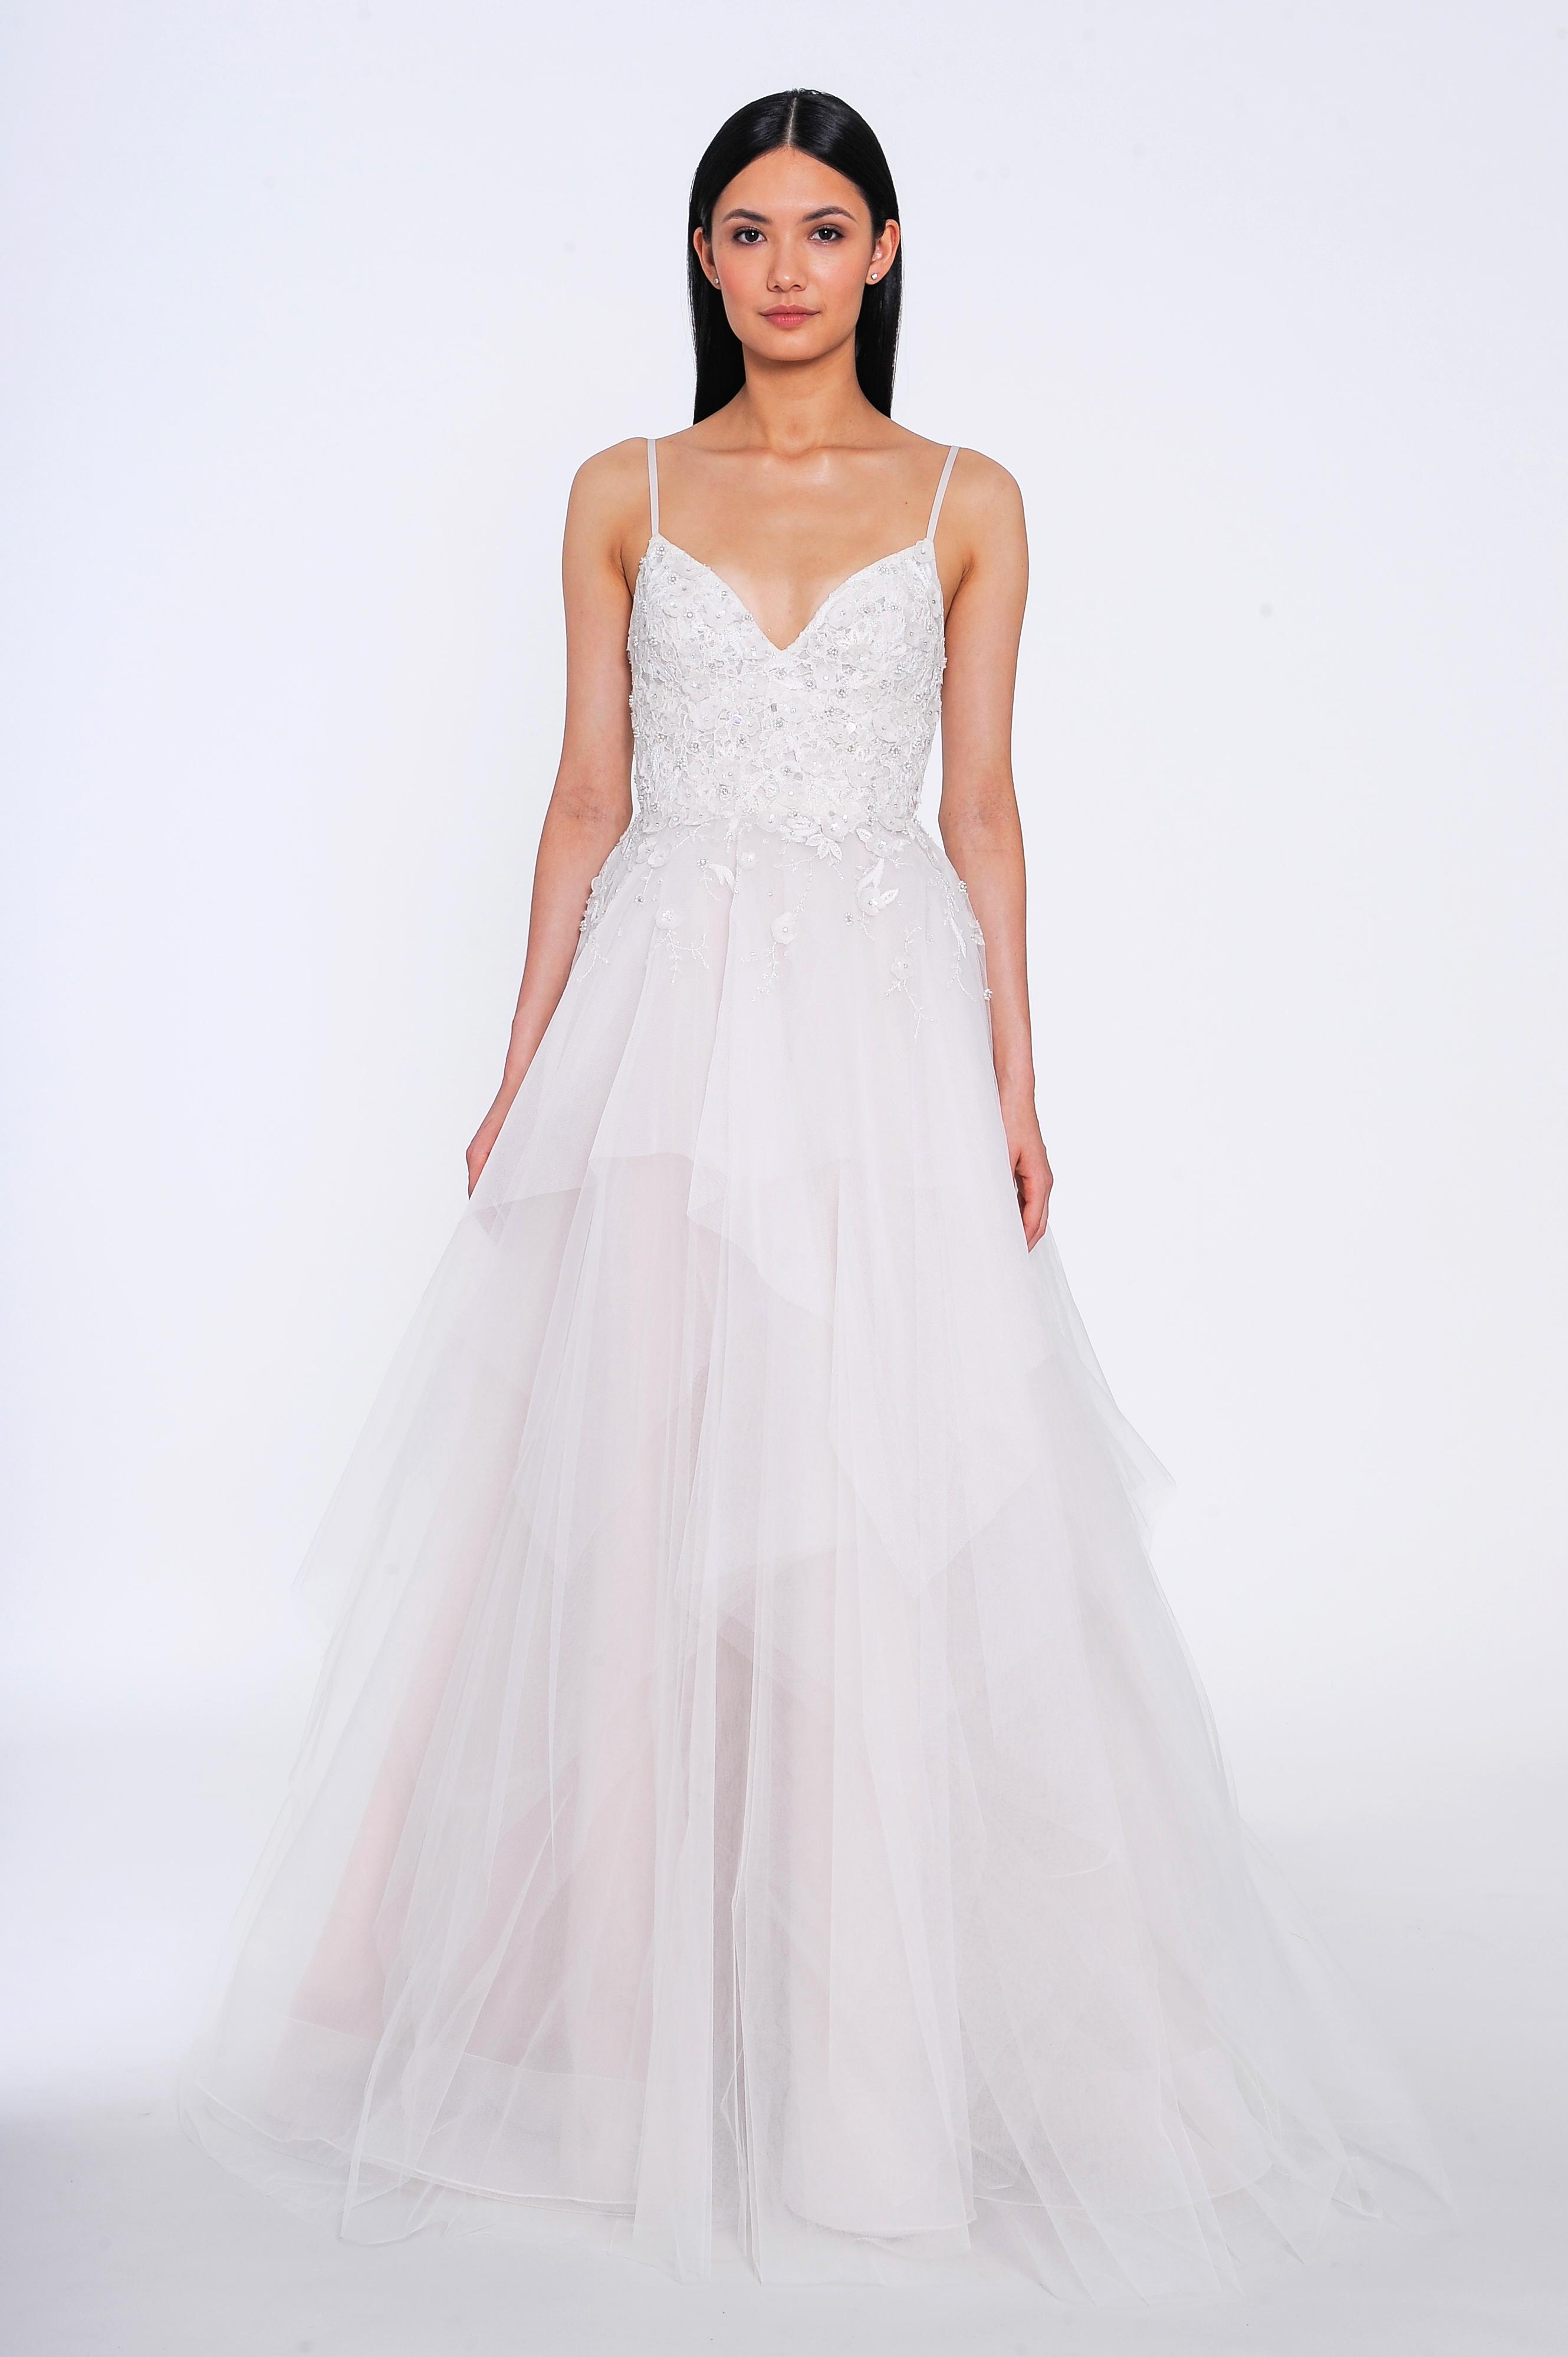 allison webb wedding dress spring 2019 tiered spaghetti strap